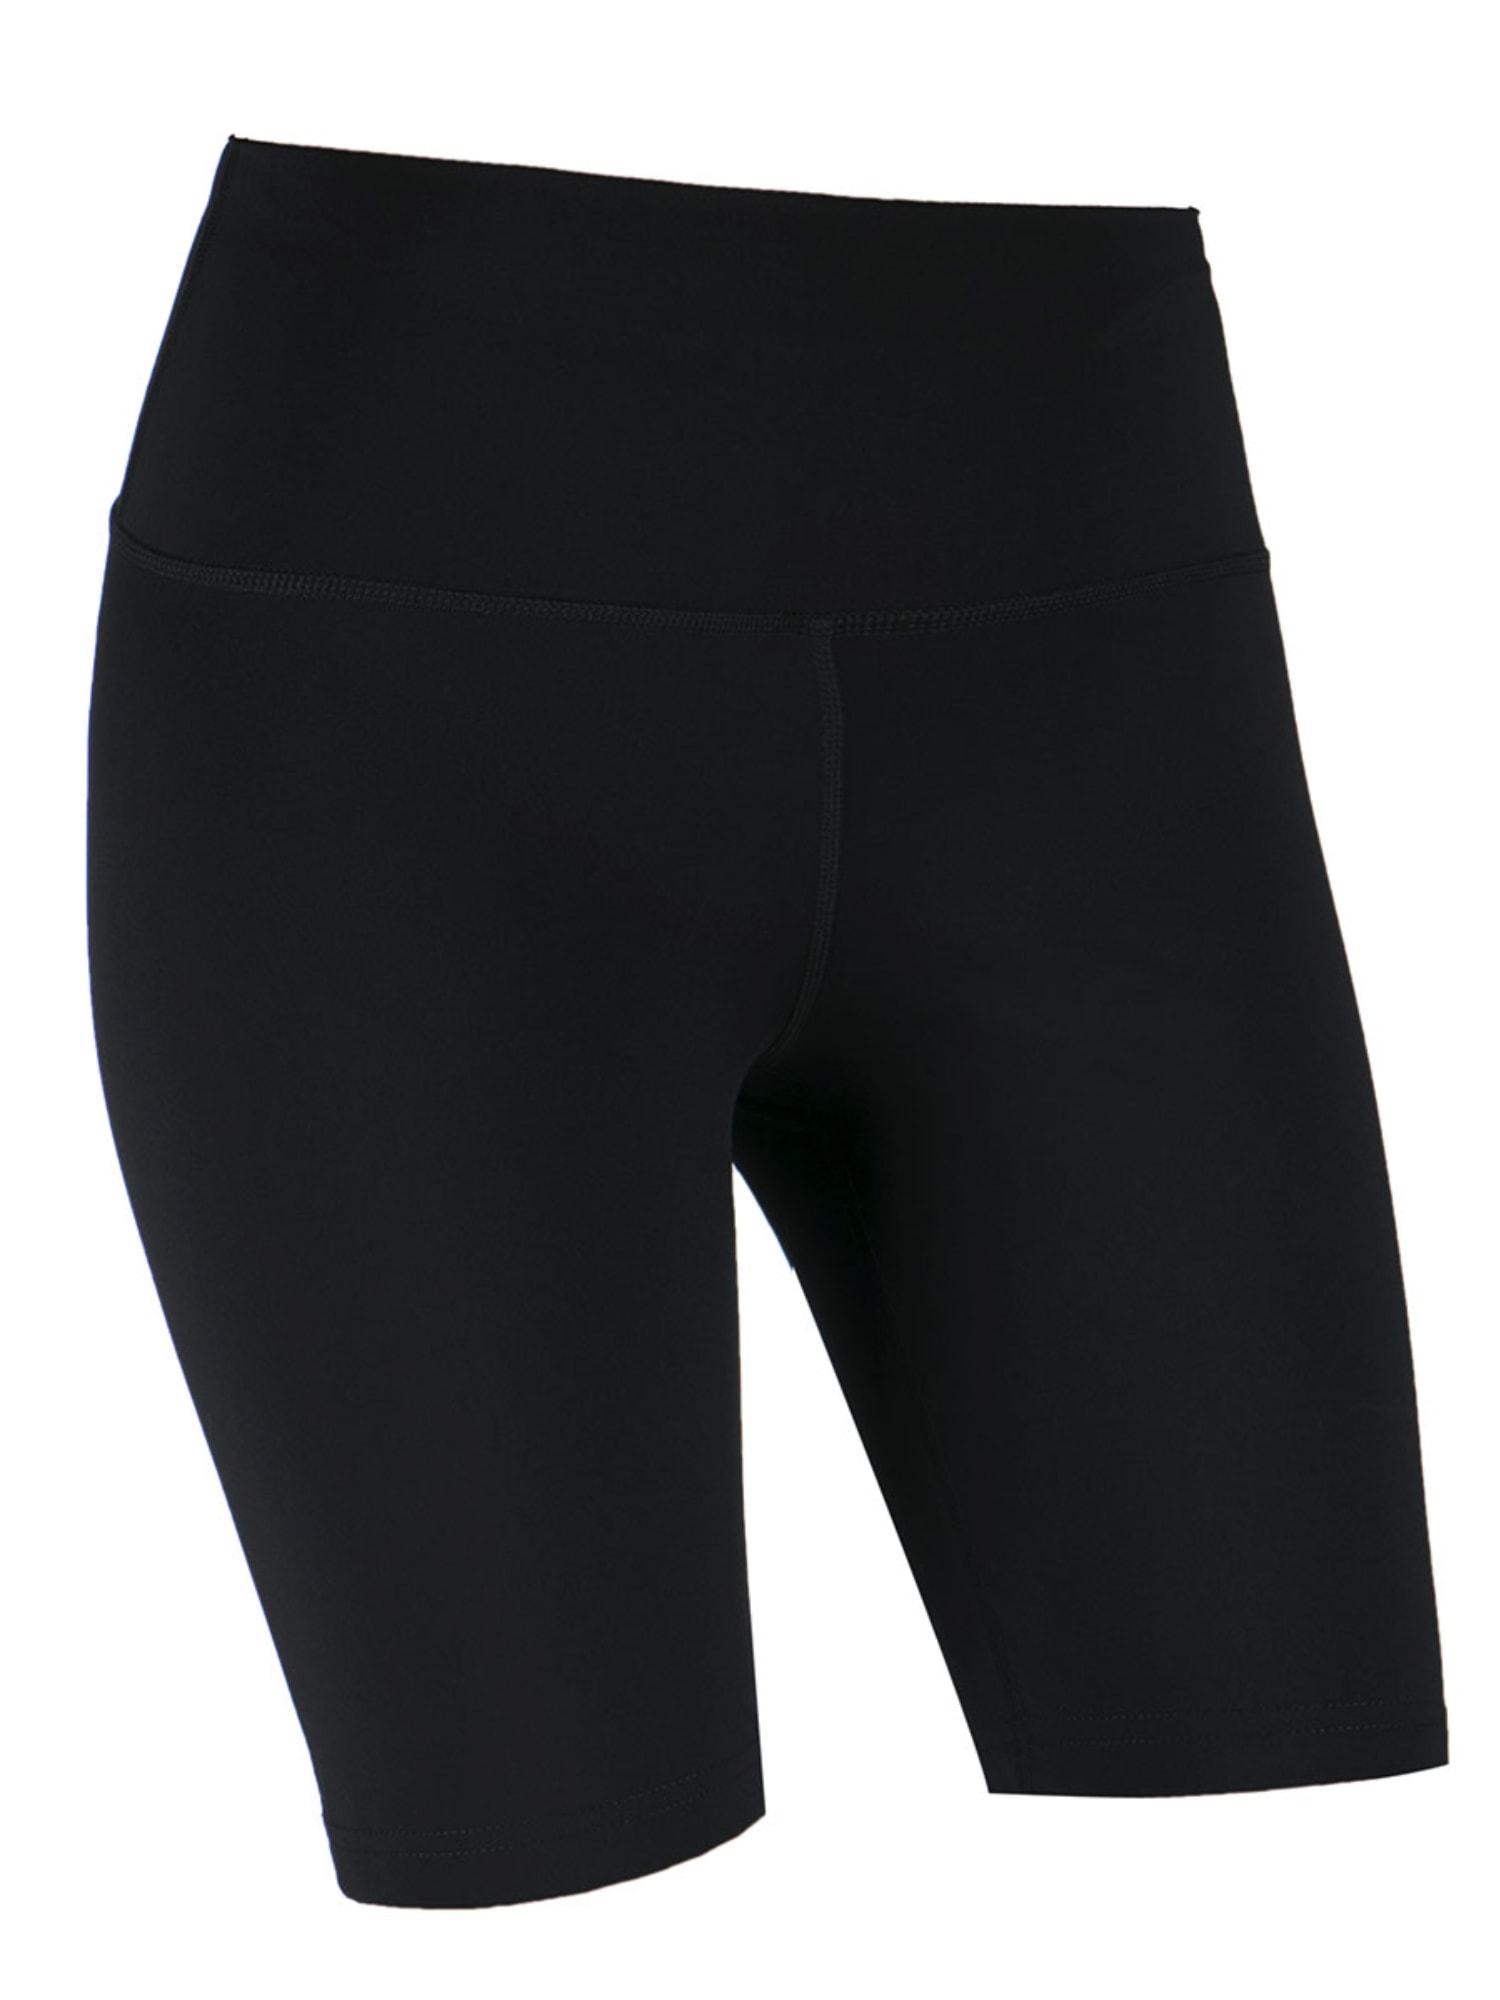 Athlecia Franz High Waist Shorts Black